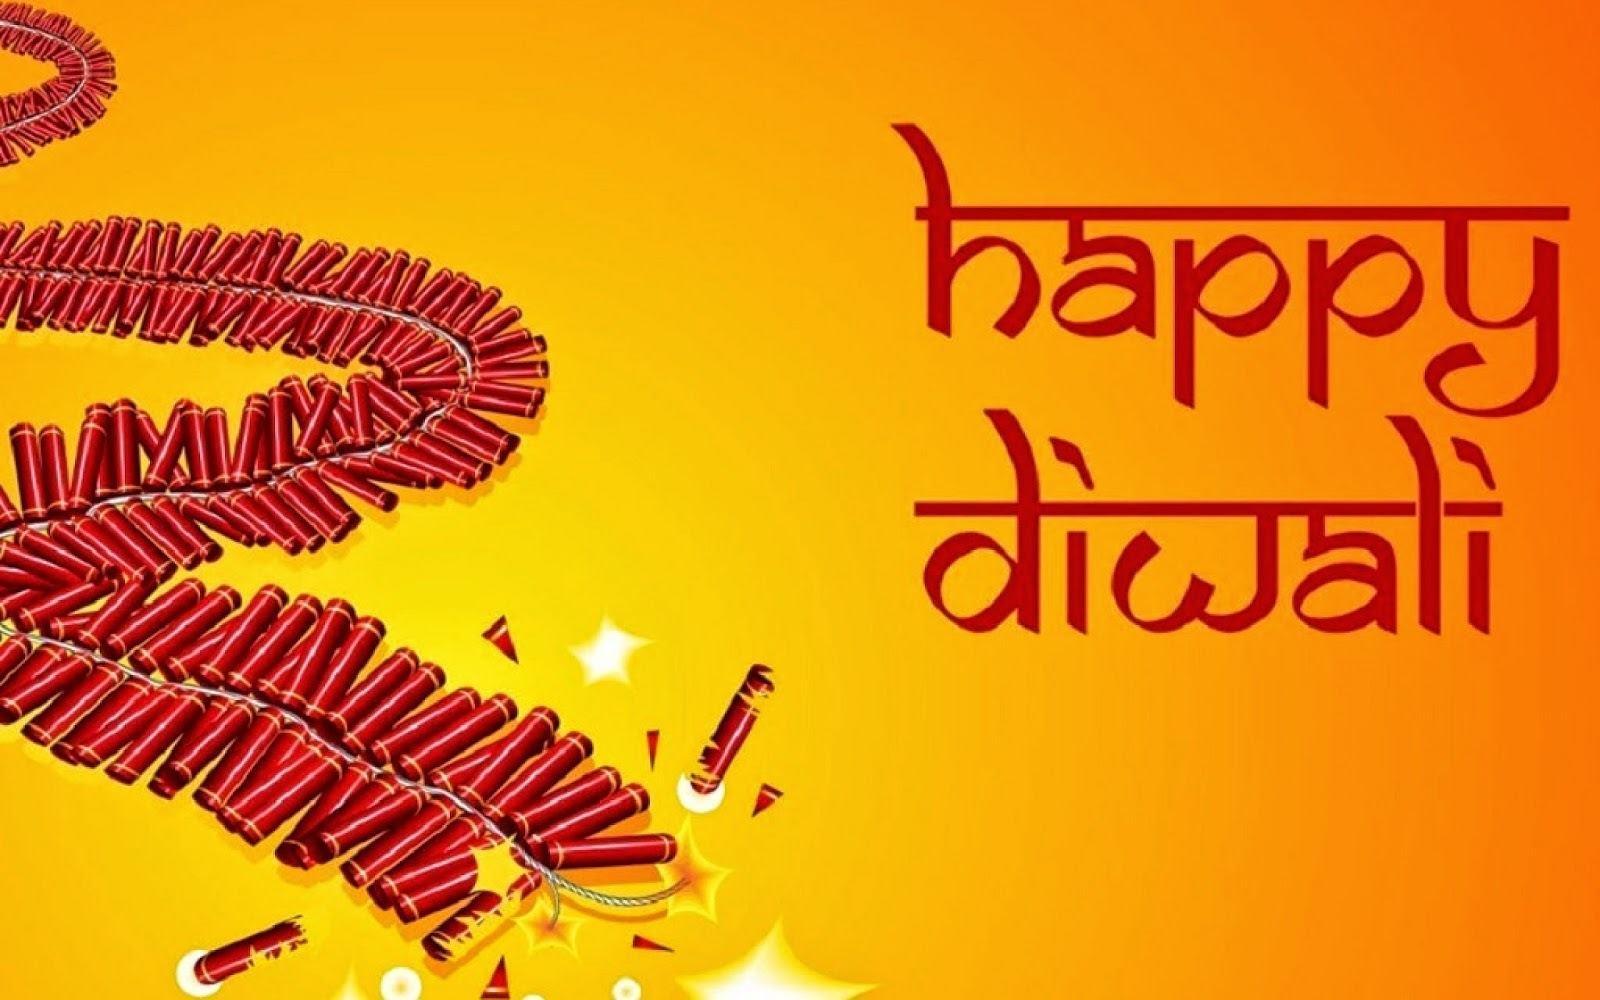 Ganesh Laxmi Wallpaper Full Size Hd Happy Diwali Images 2017 Diwali Wallpapers Hd Free